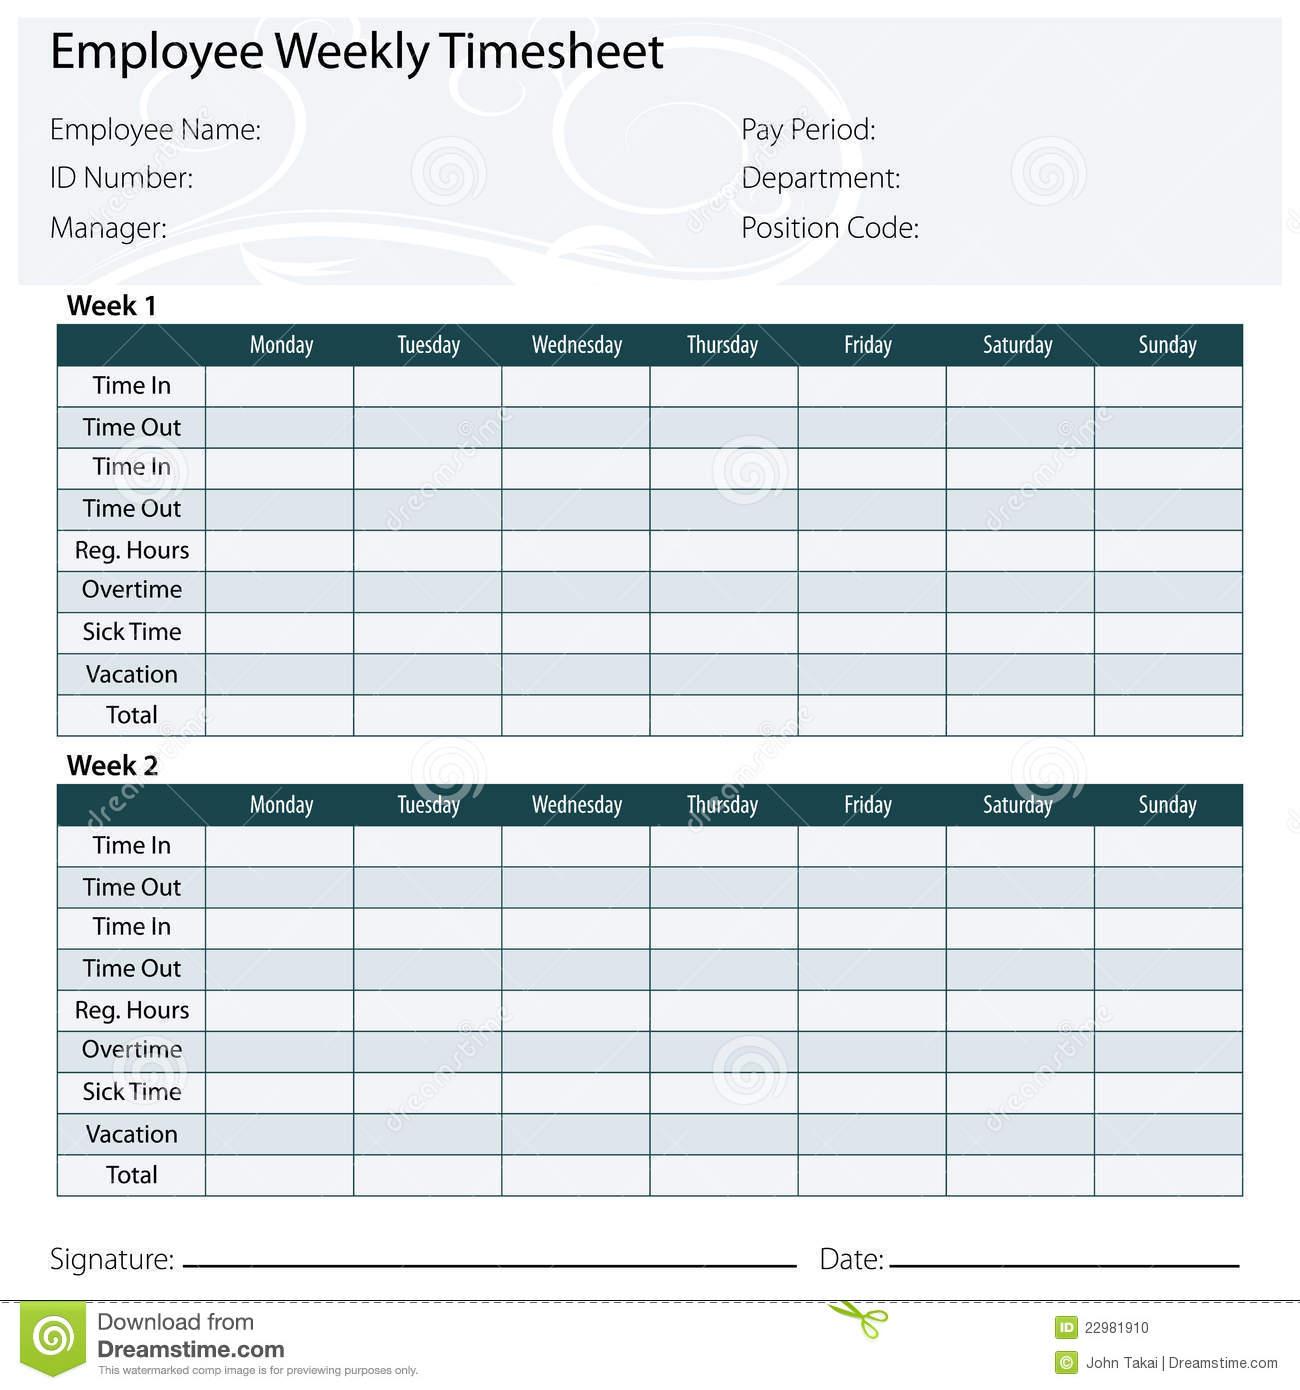 Employee Timesheet Template Stock Vector - Illustration Of Template For Payroll Timesheet Template